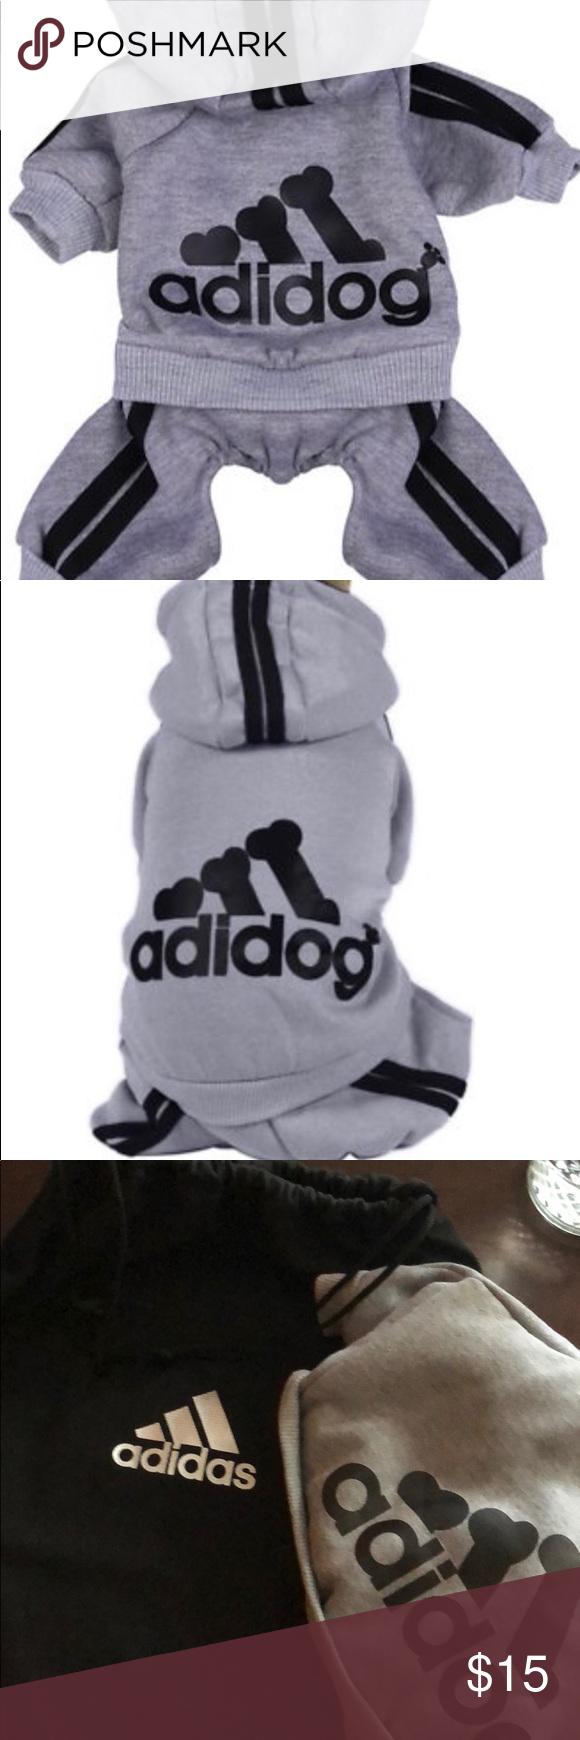 Small Adidog Adidas Dog Sweatshirt With Bag Dog Sweatshirt Sweatshirts Bags [ 1740 x 580 Pixel ]